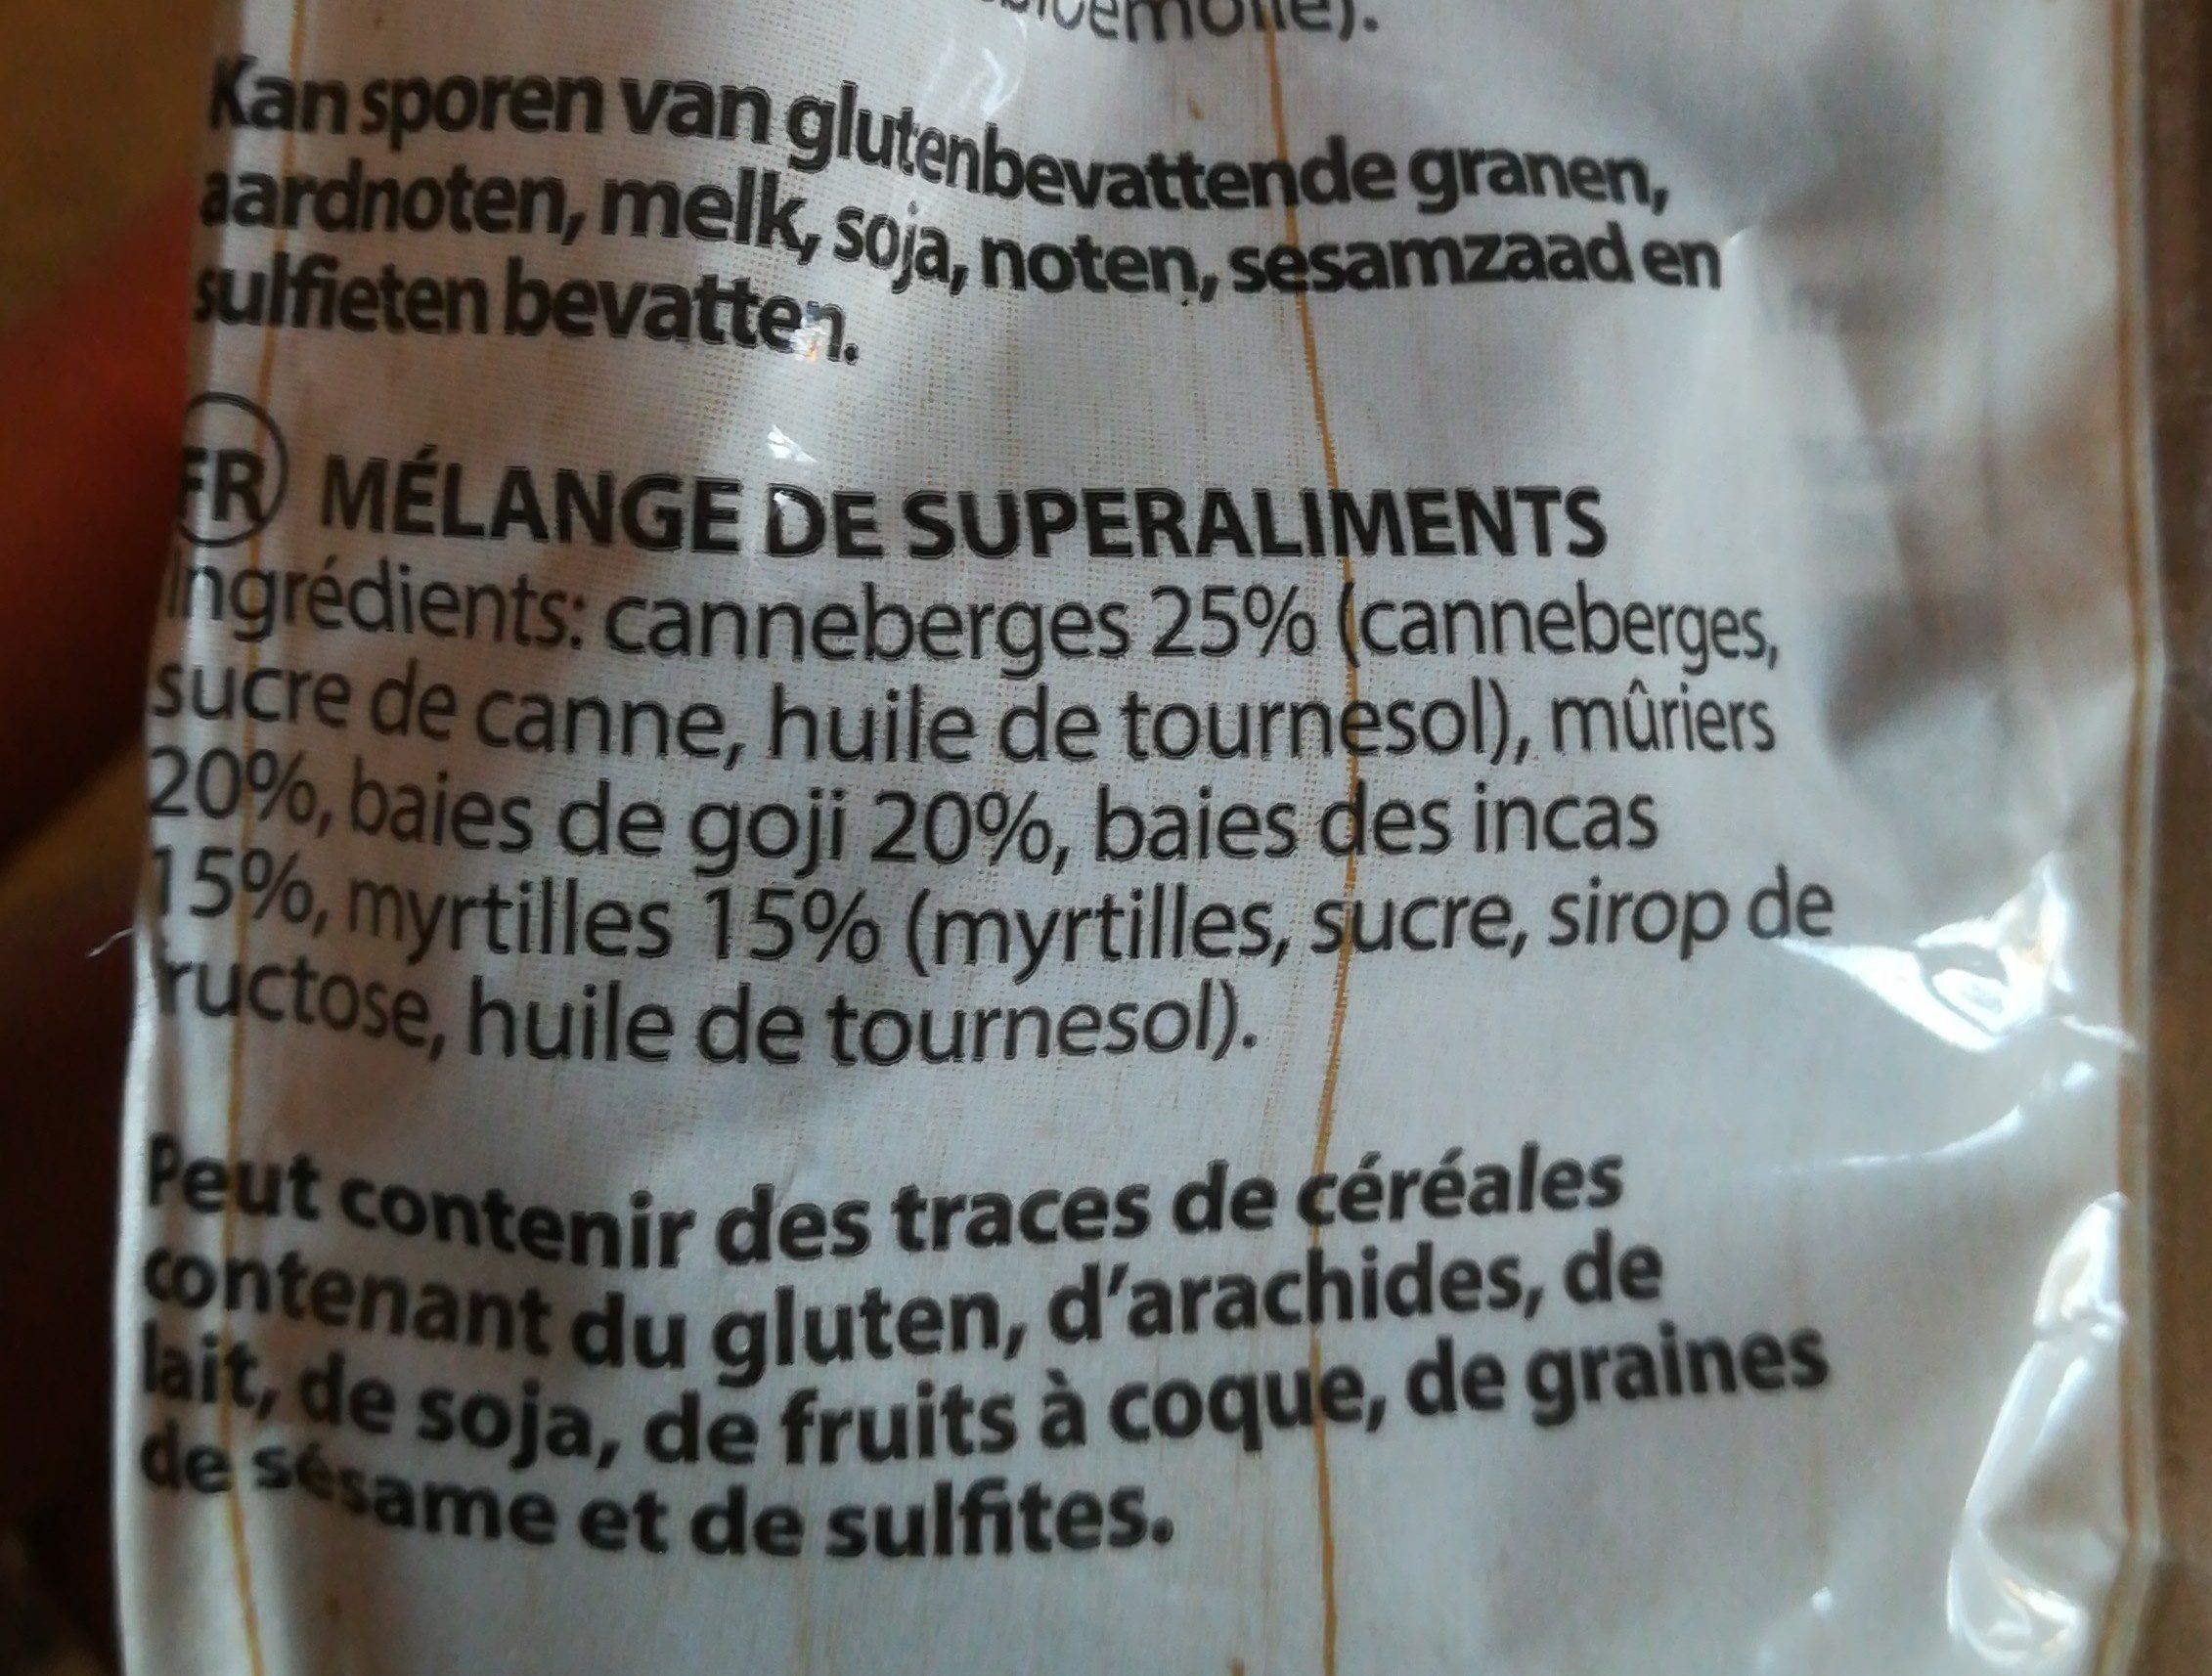 Superfood mix - Ingredients